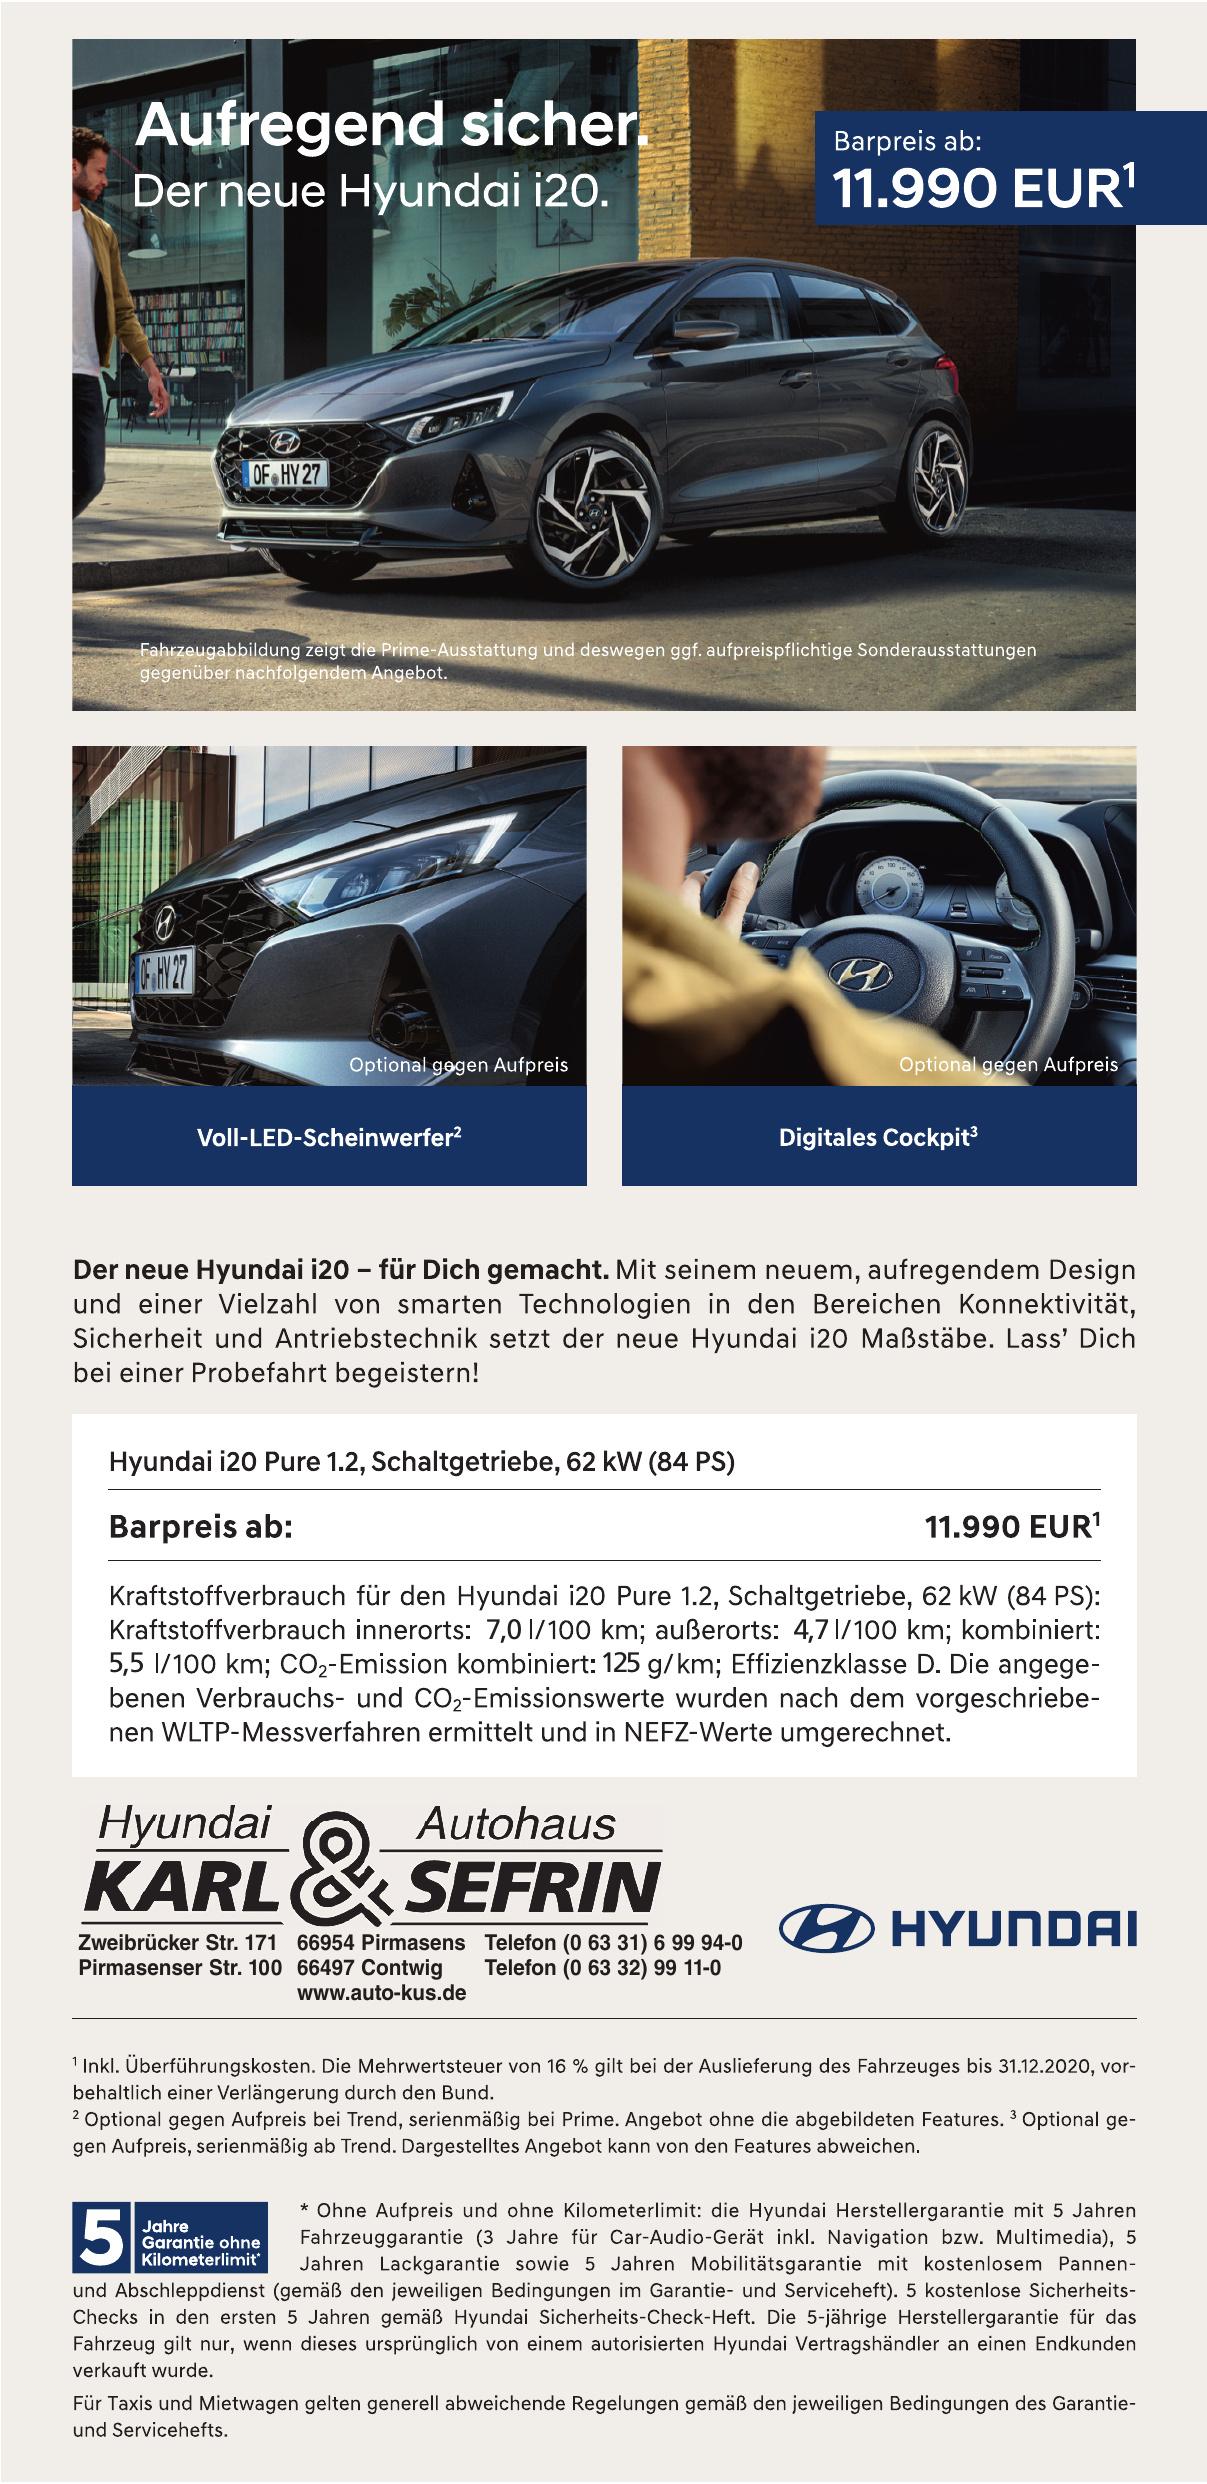 Hyundai Autohaus Karl & Sefrin